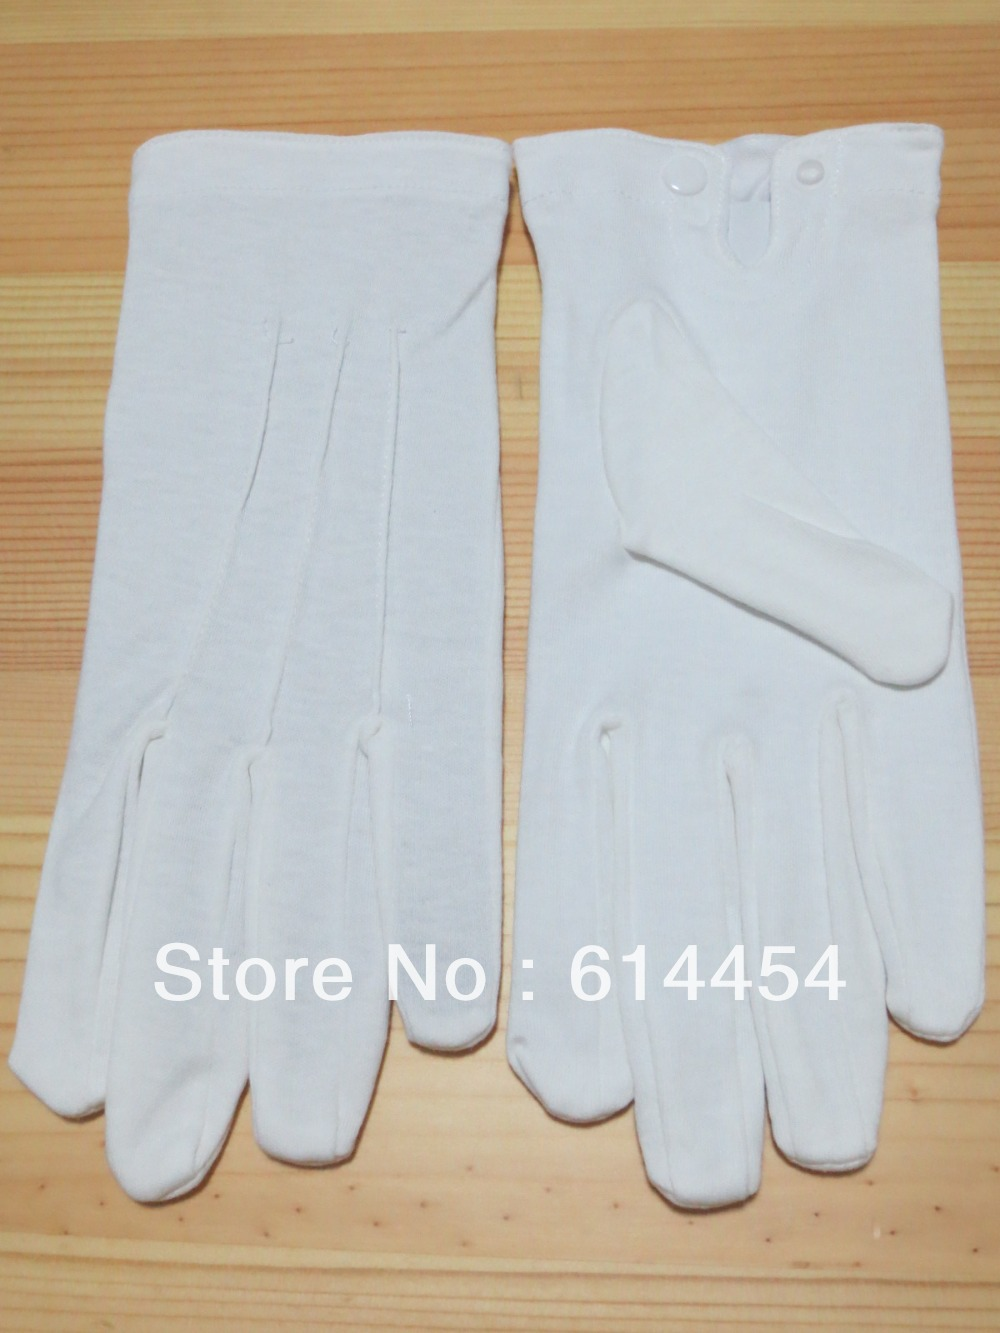 White apron freemason - Hot Sell Good Quality 100 Cotton White Masonic Gloves China Mainland